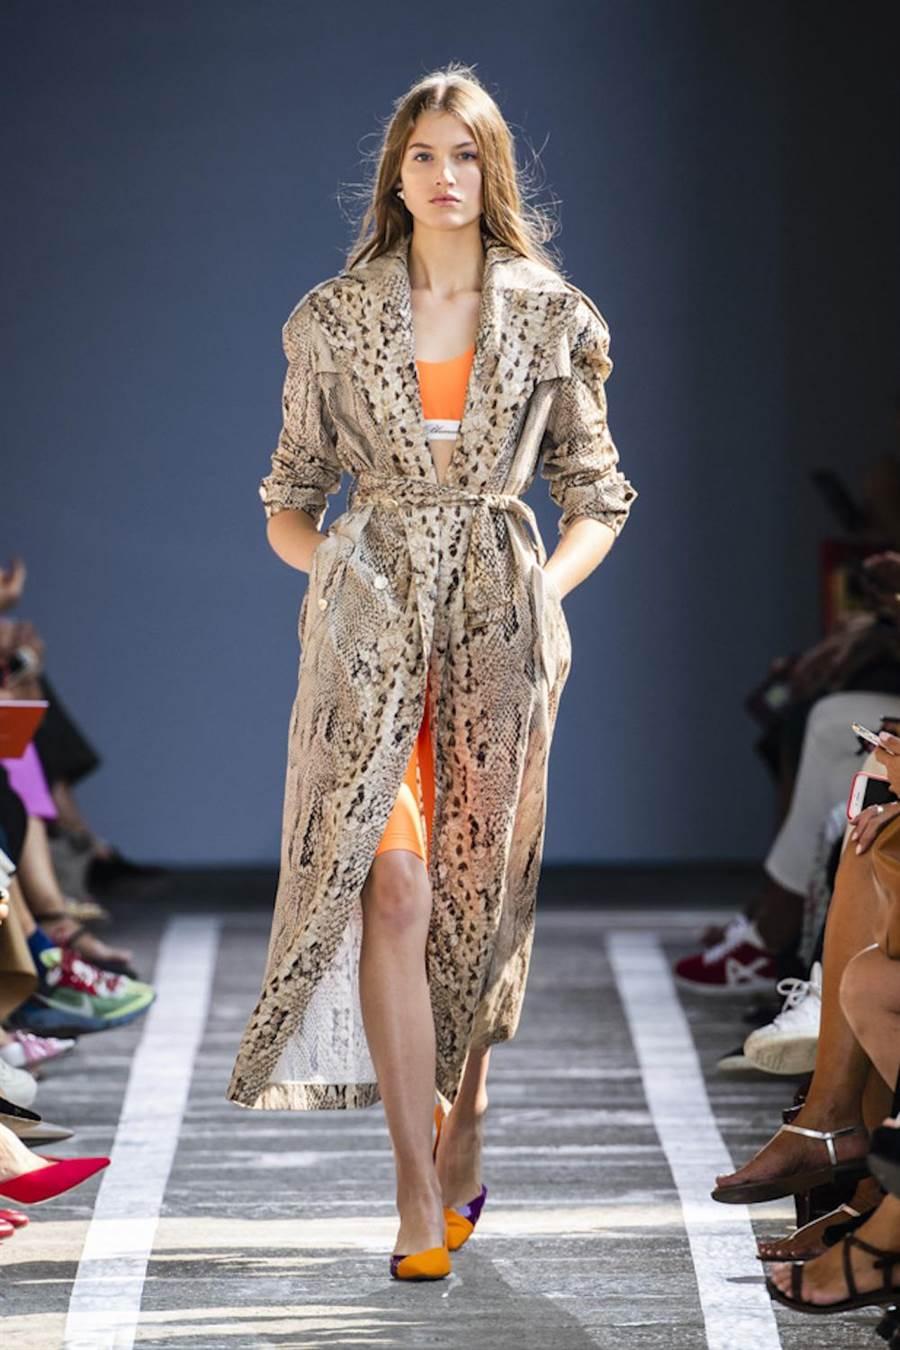 Blumarine长版蛇纹绑带风衣14万元,橘色内搭上衣1万800元,橘色紧身单车裤1万1800元。(BLUMARNIE提供)